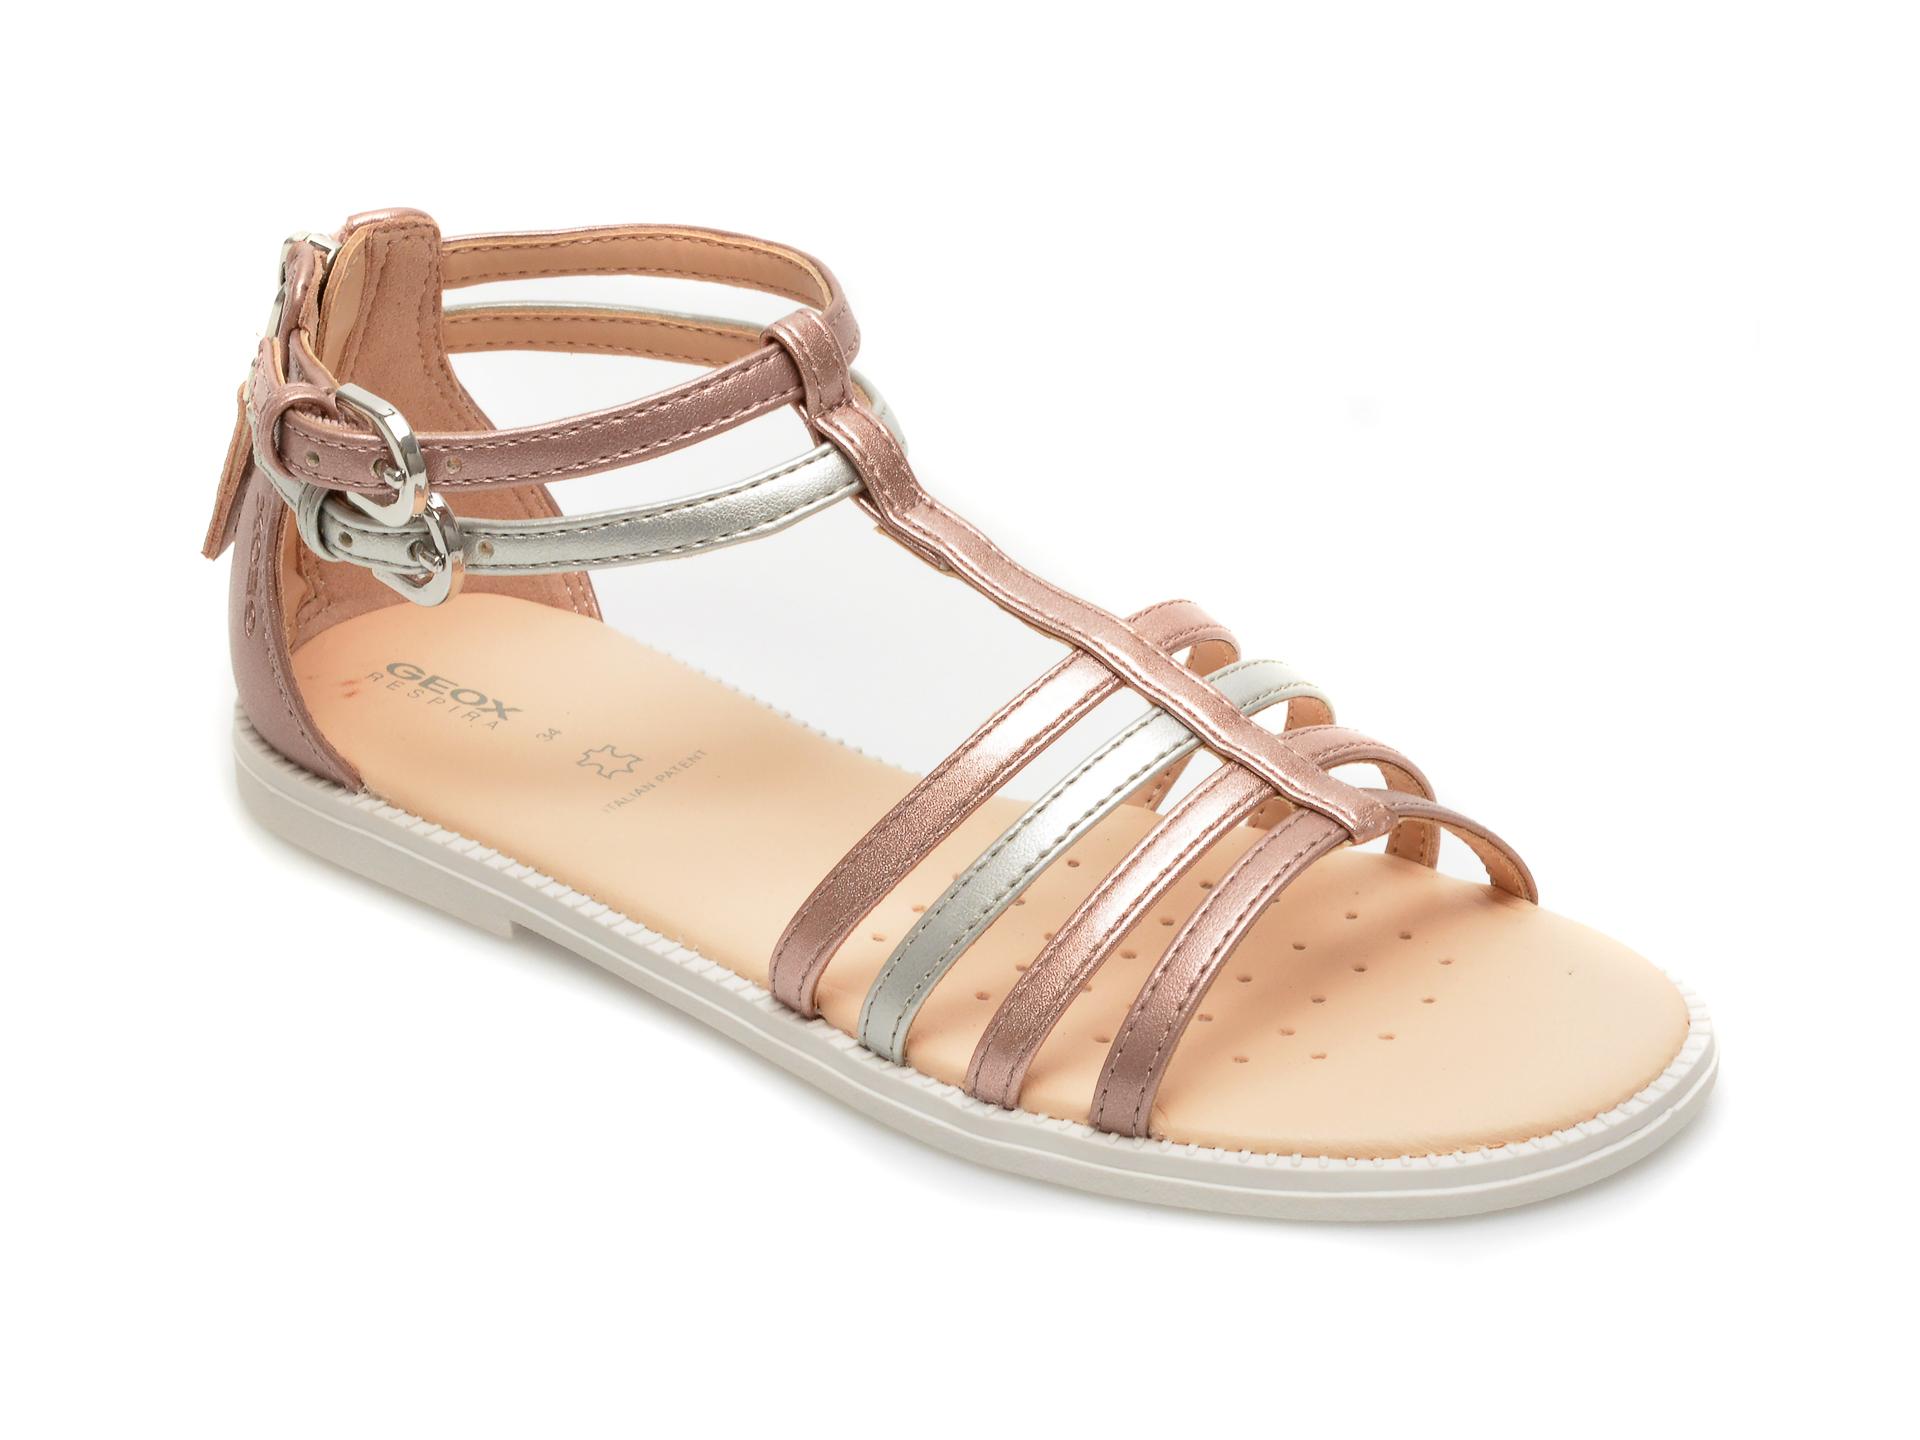 Sandale GEOX roz, J7235D, din piele ecologica